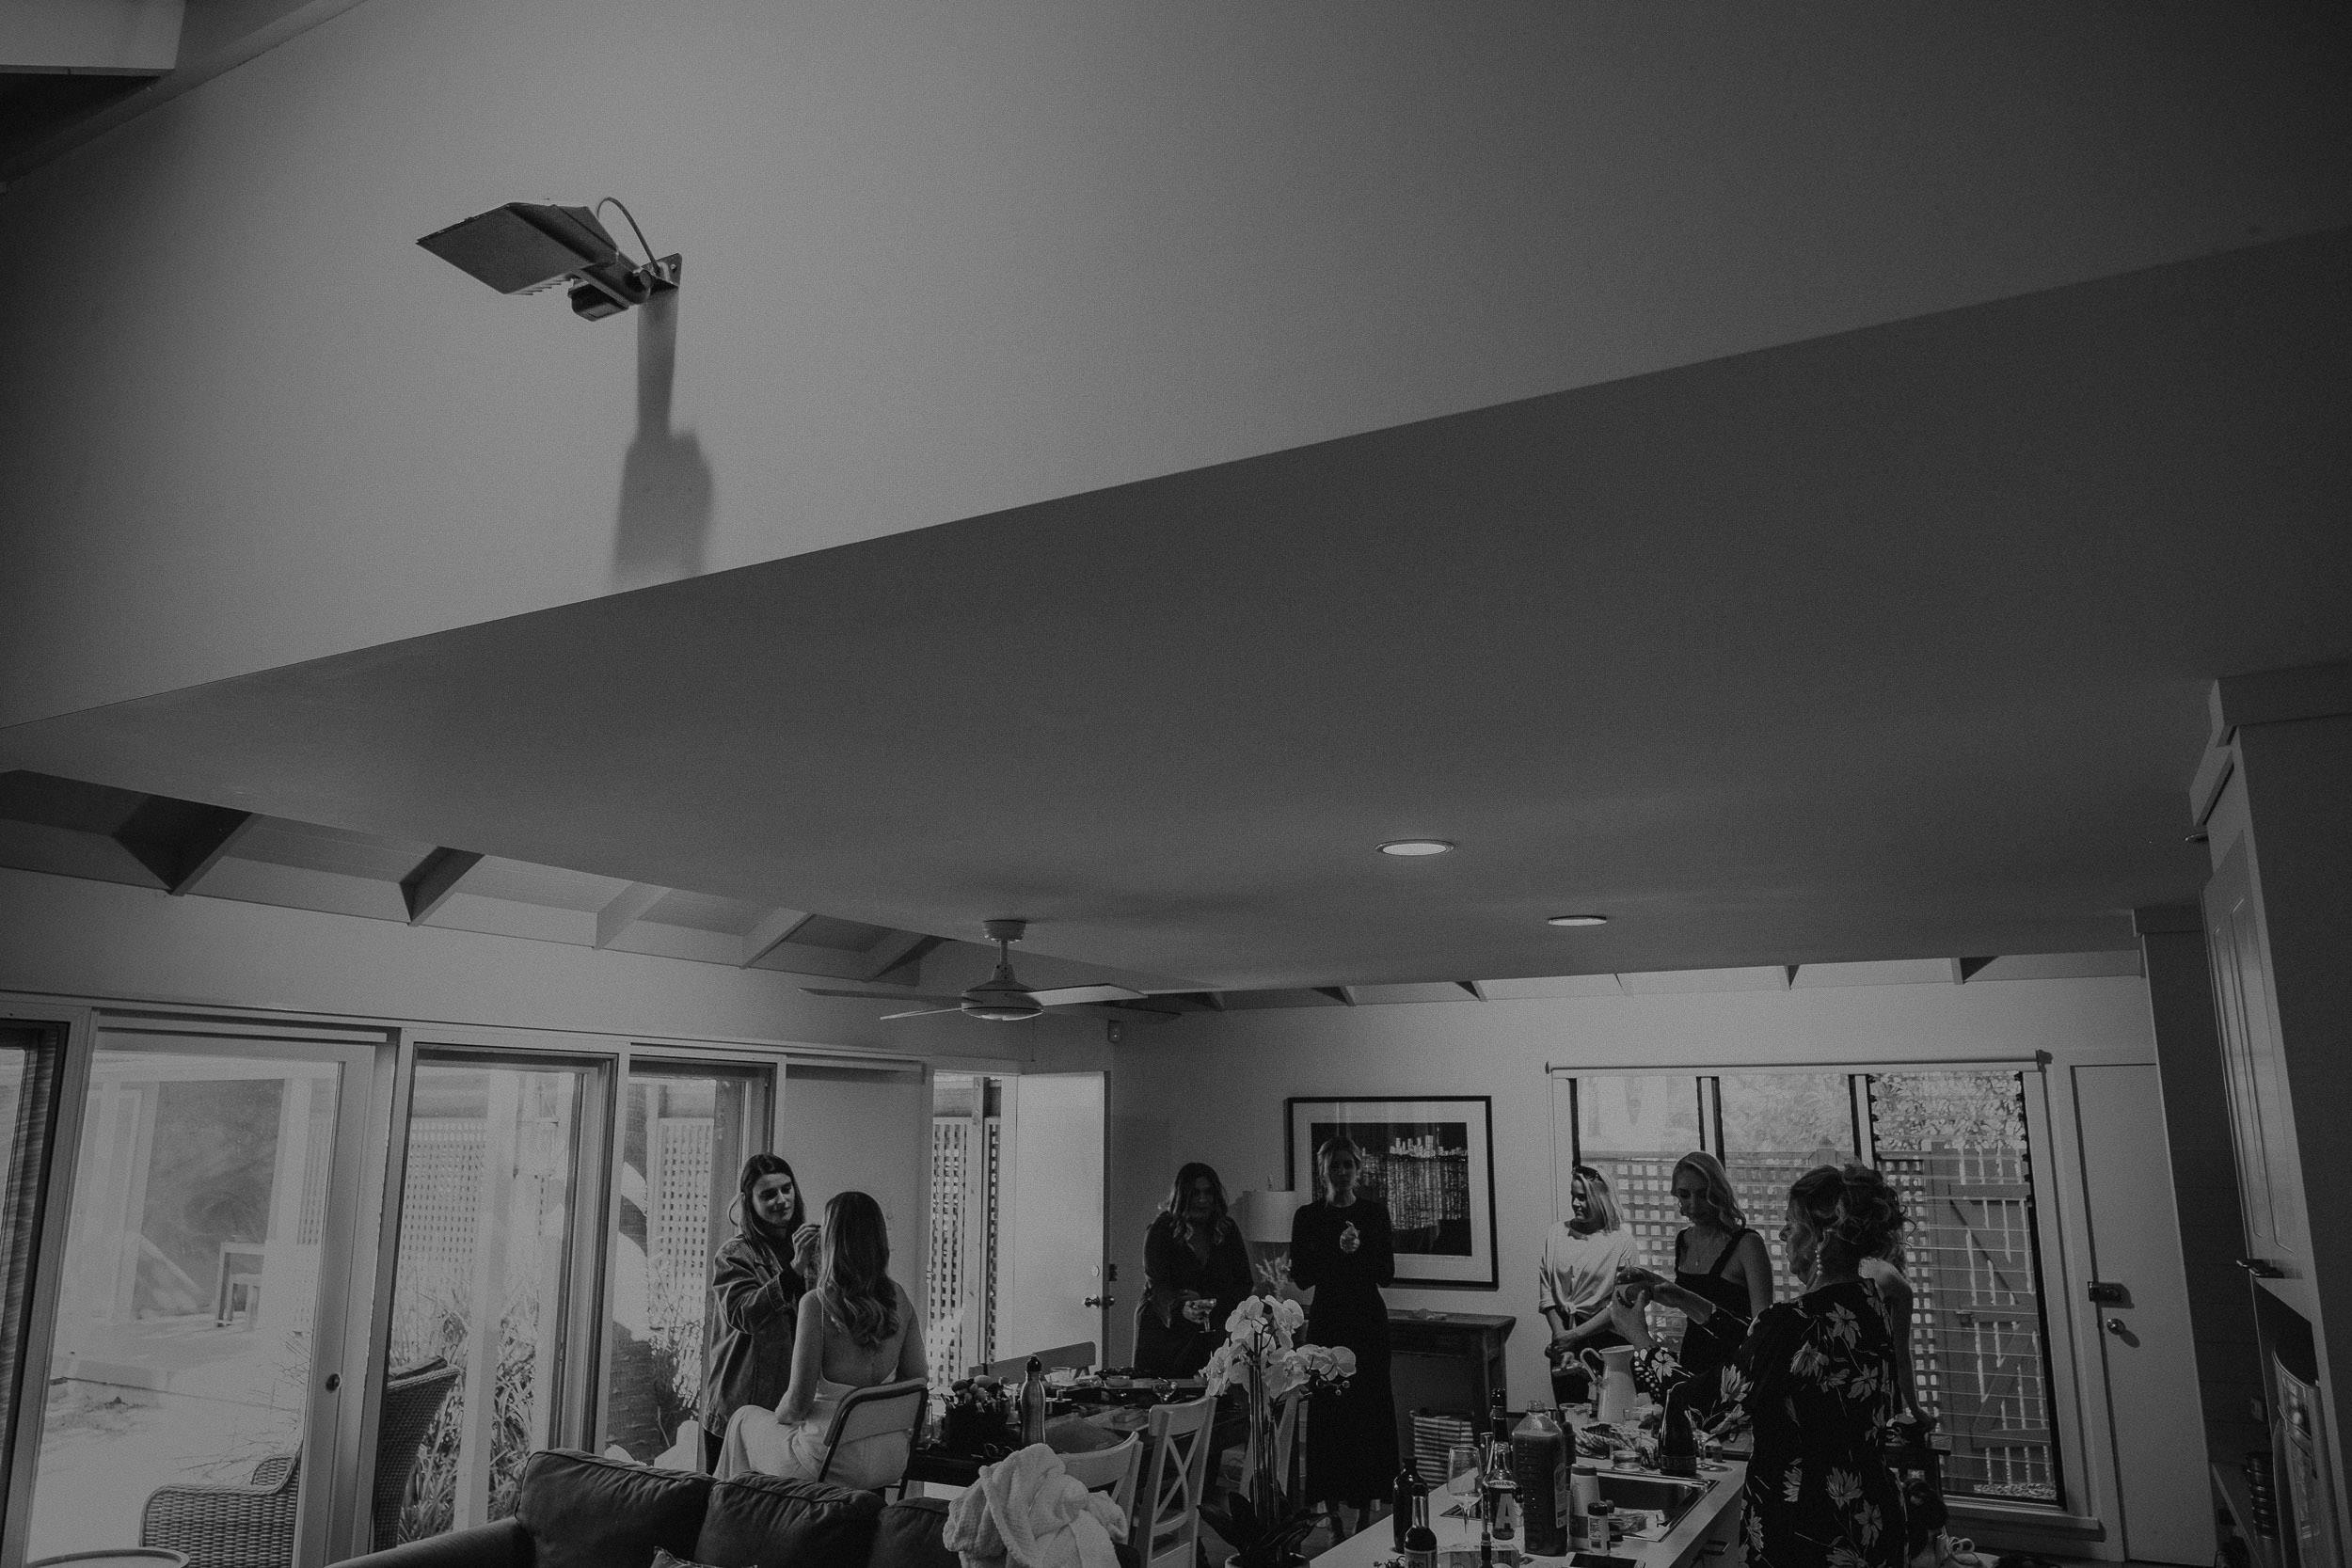 S&A Elopement - Kings & Thieves - Shred 'Til Dead - Central Coast Beach Forest Wedding - 53.jpg